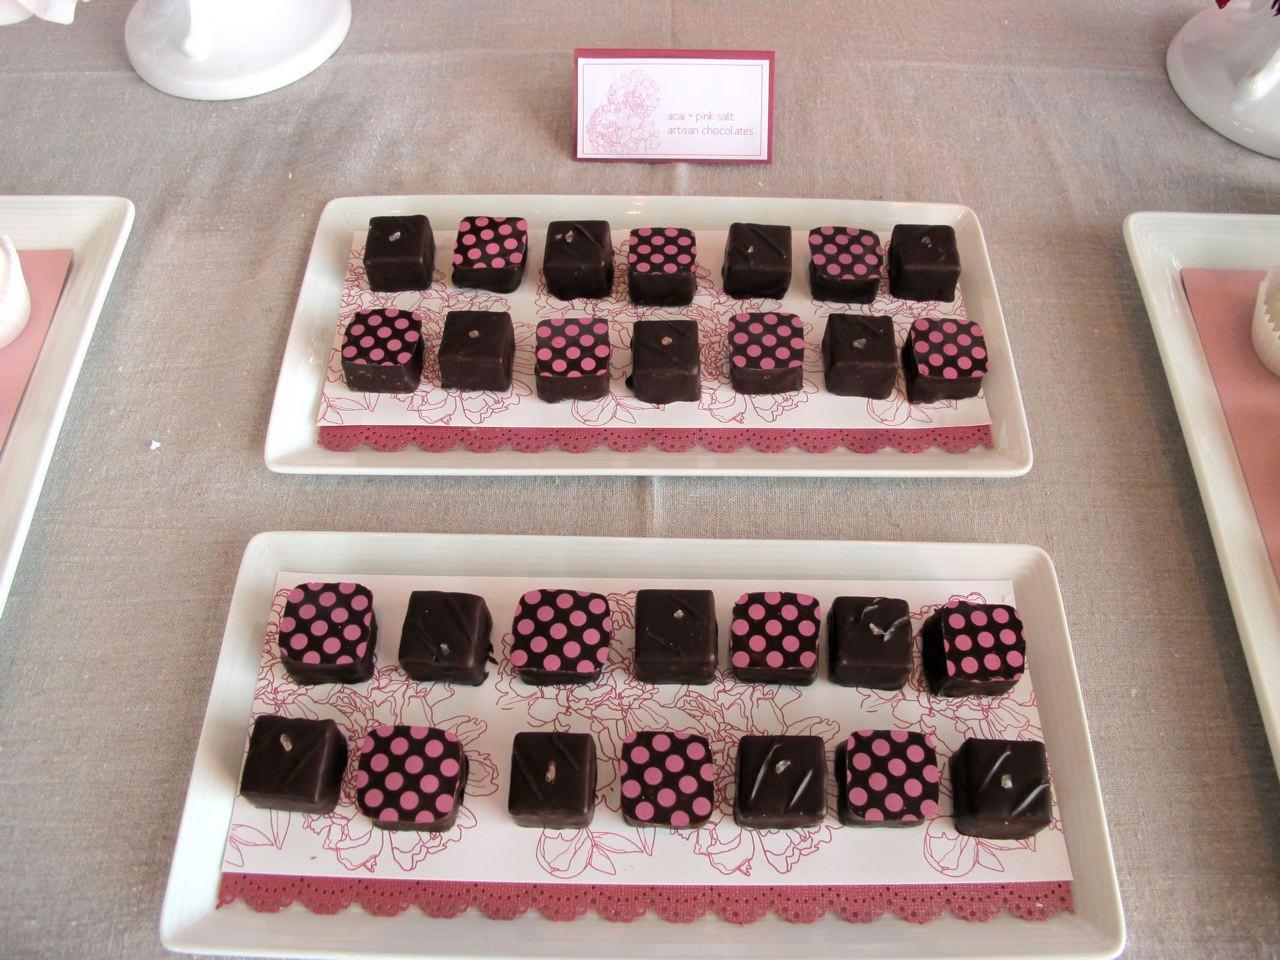 Pink Salt and Acai Pomegranate chocolate